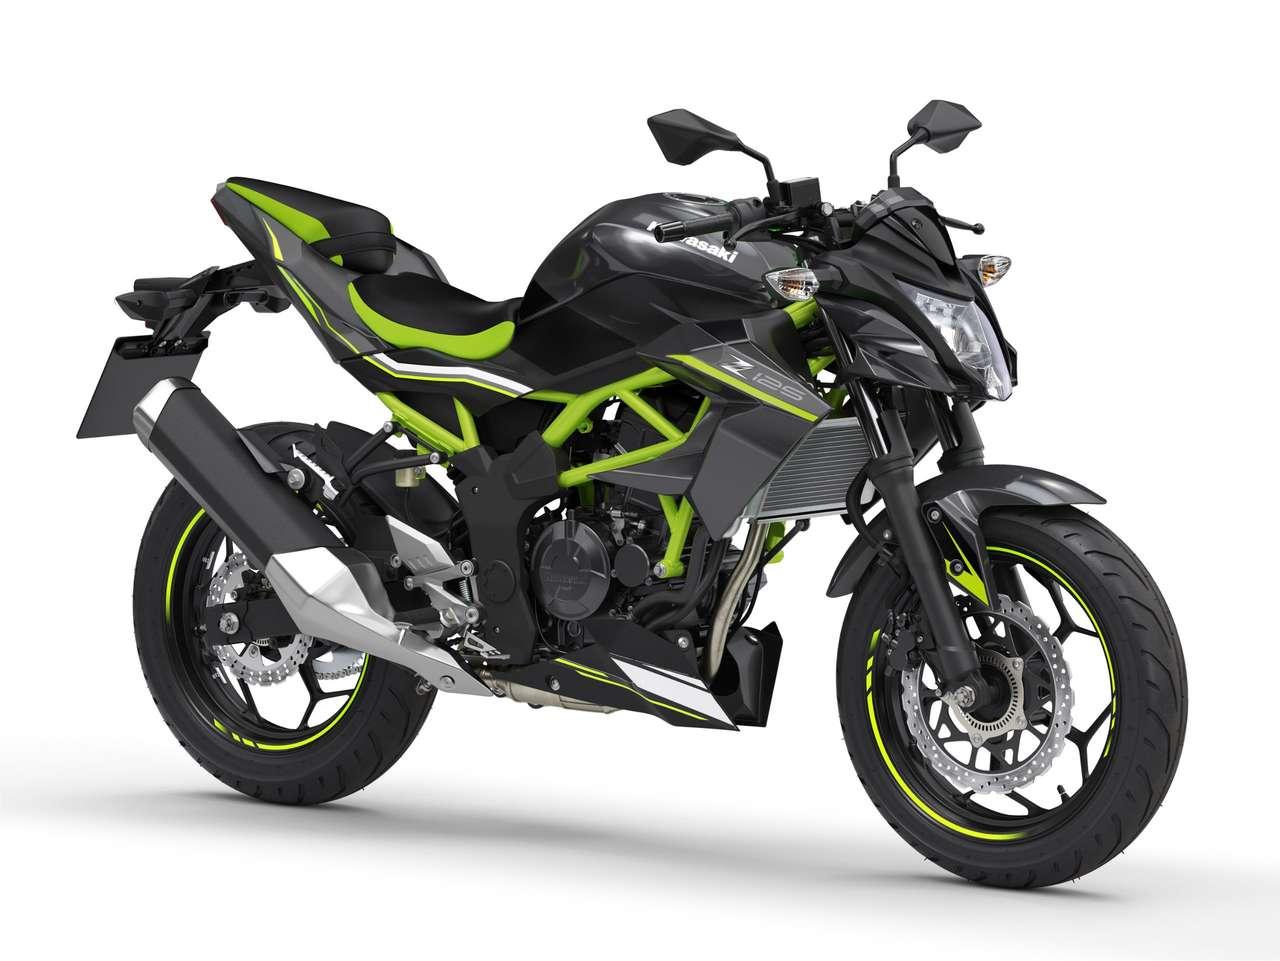 Z125: Metallic Flat Spark Black/Metallic Spark Black